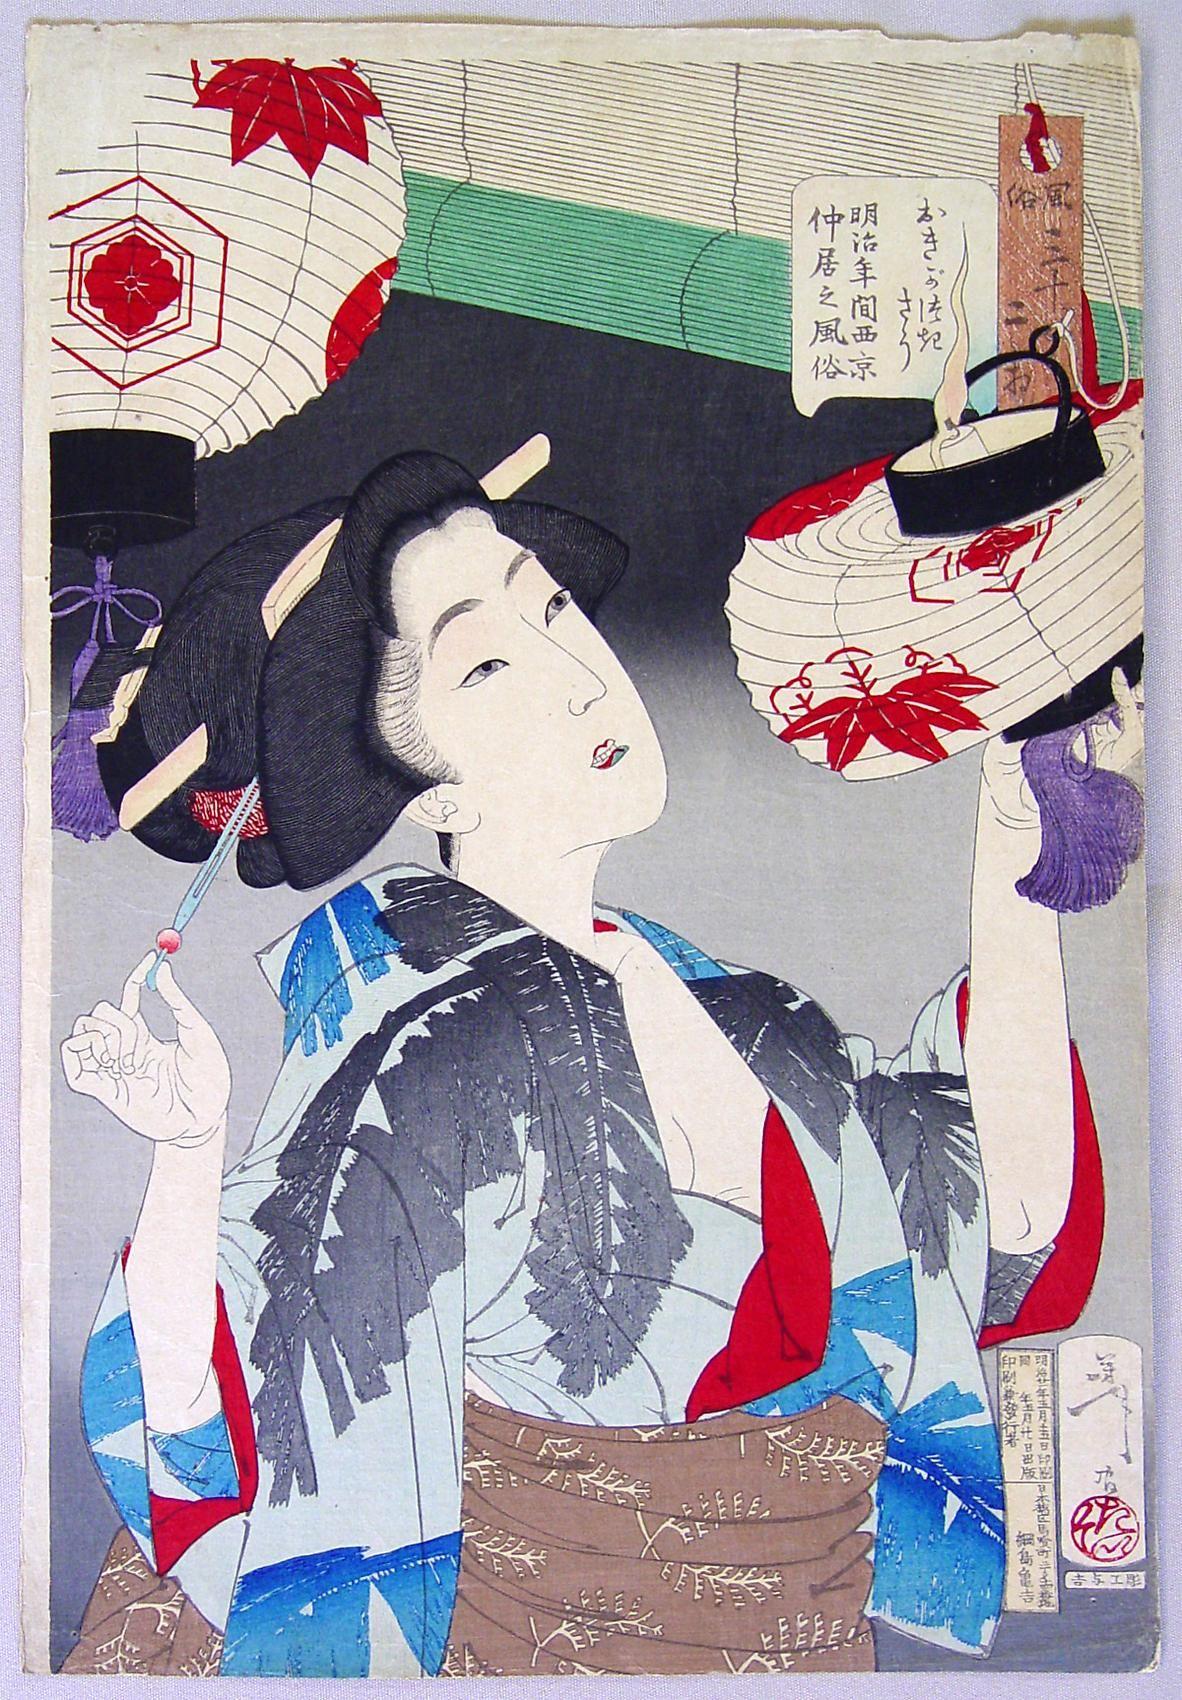 Subject: Kyoto Waitress in the Meiji Era